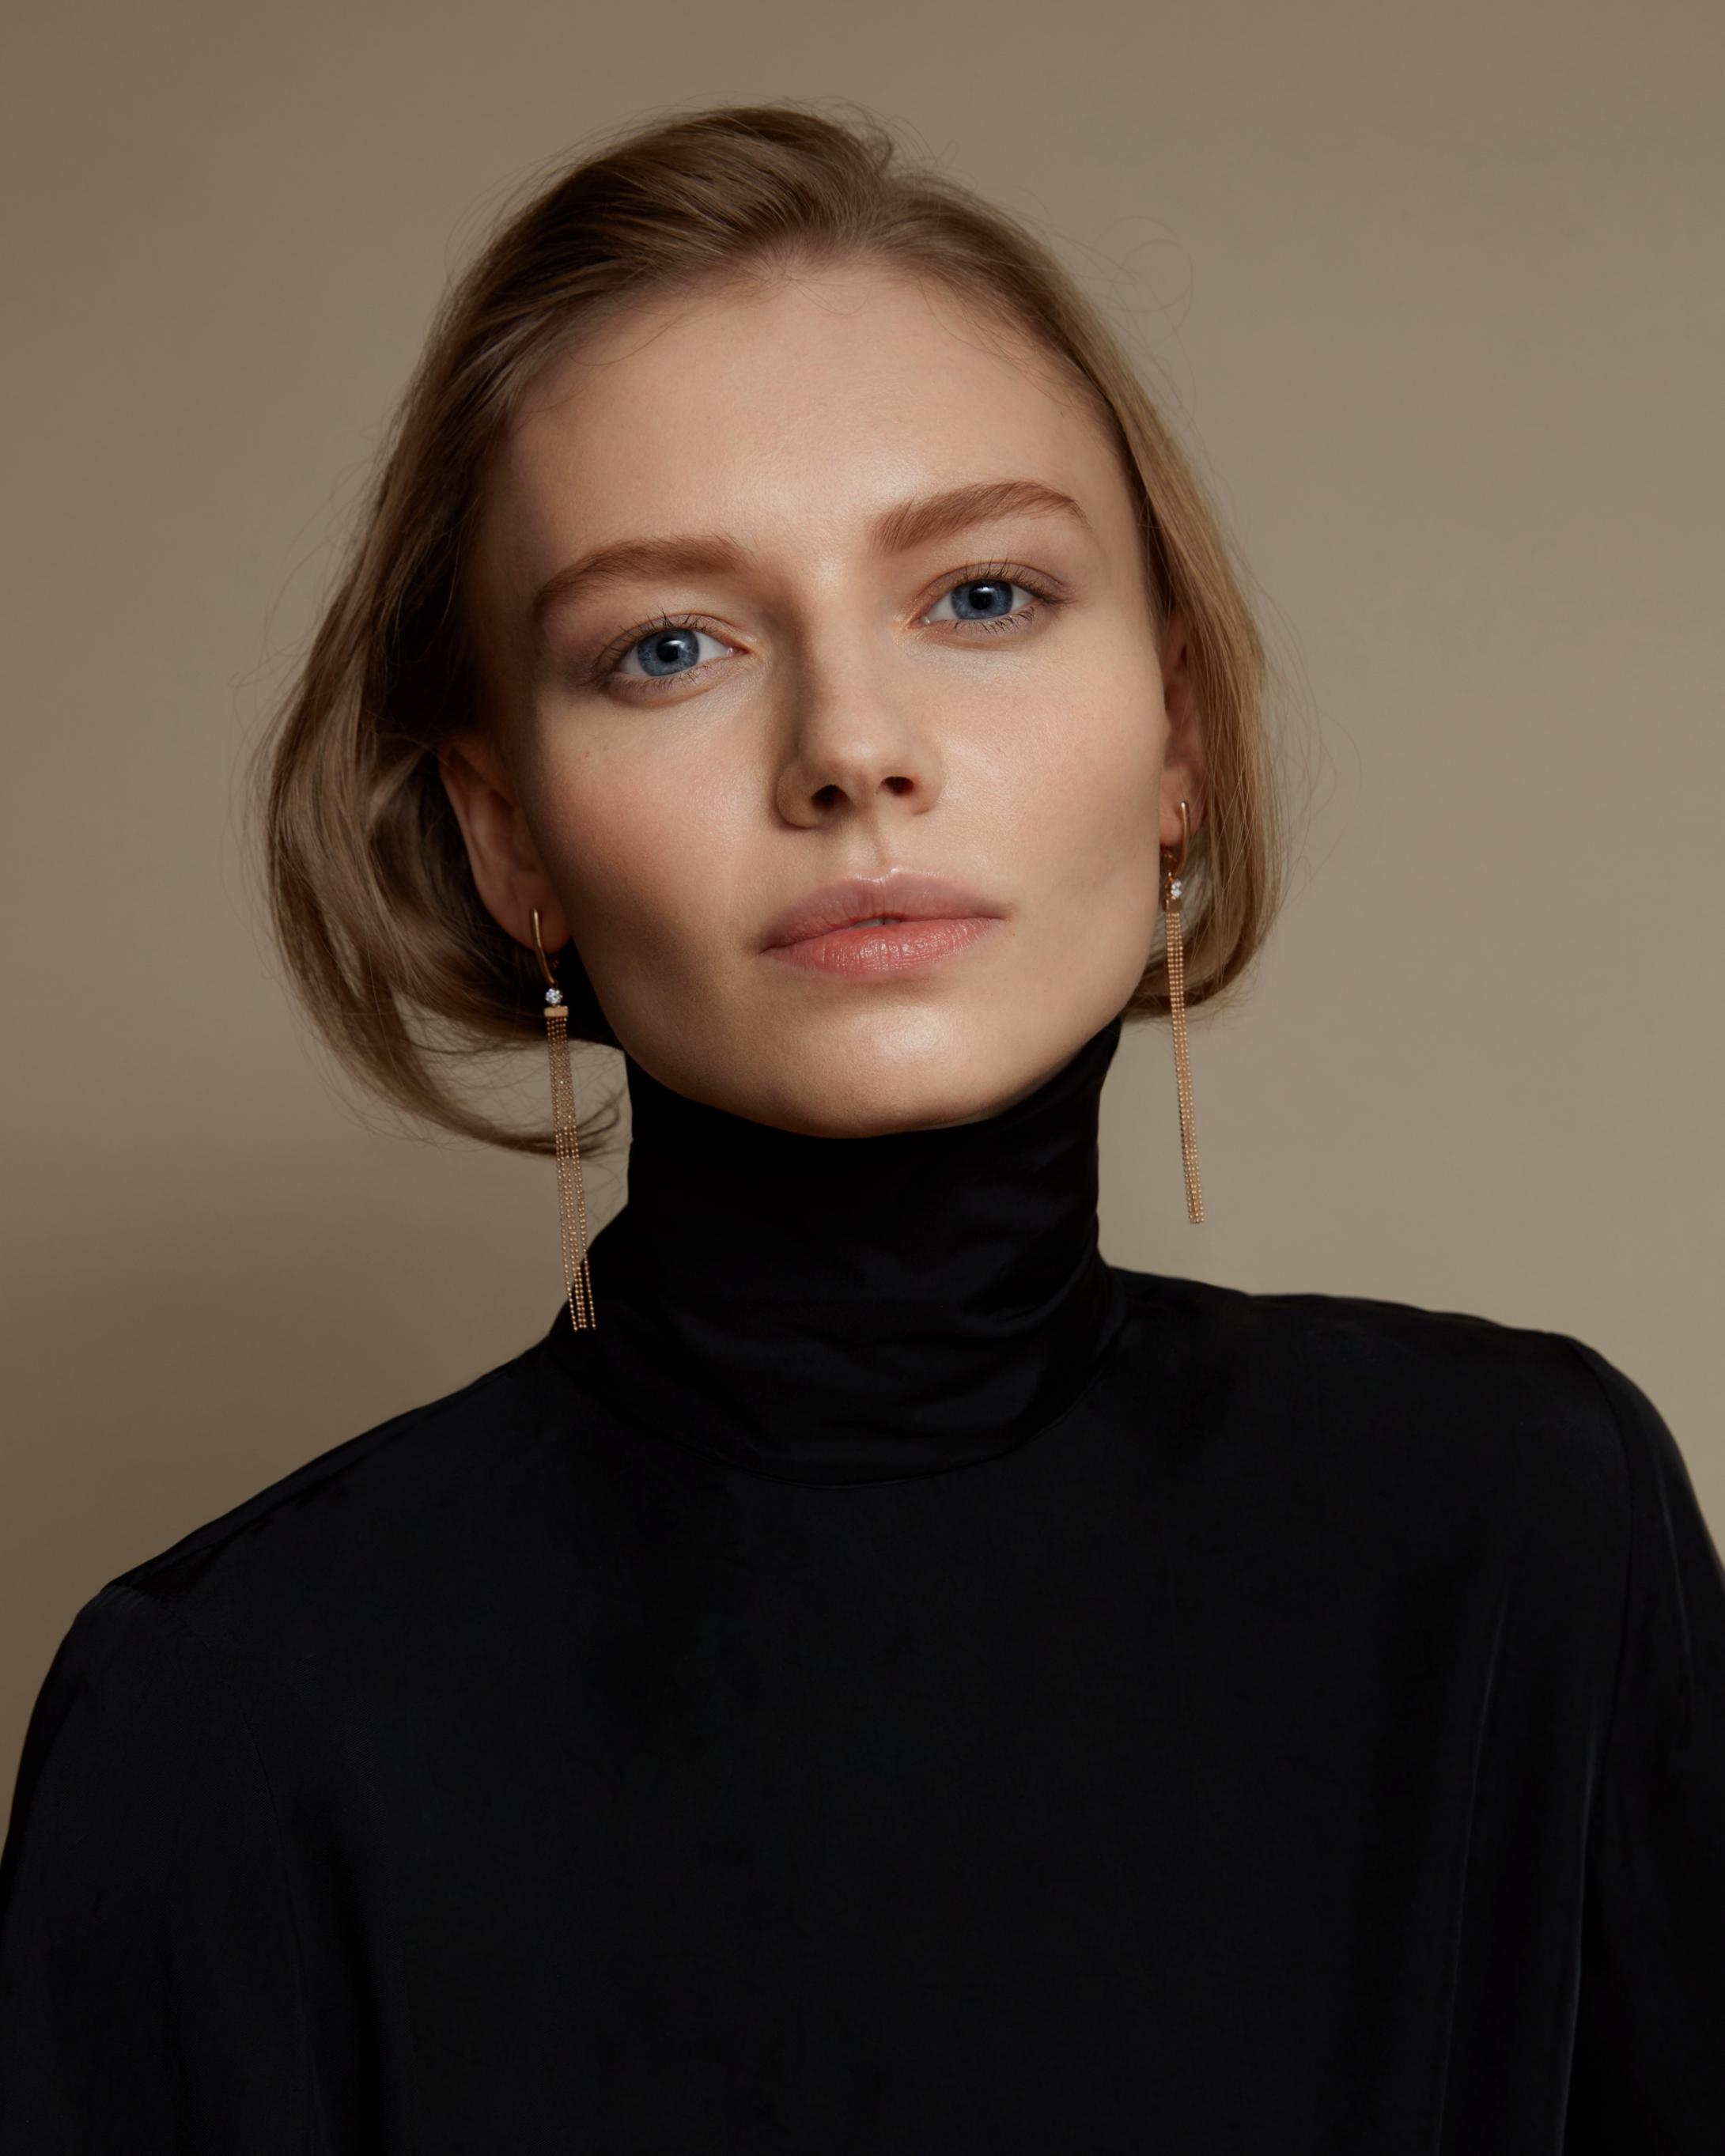 Tali beauty_jewellery-iakovos (3)